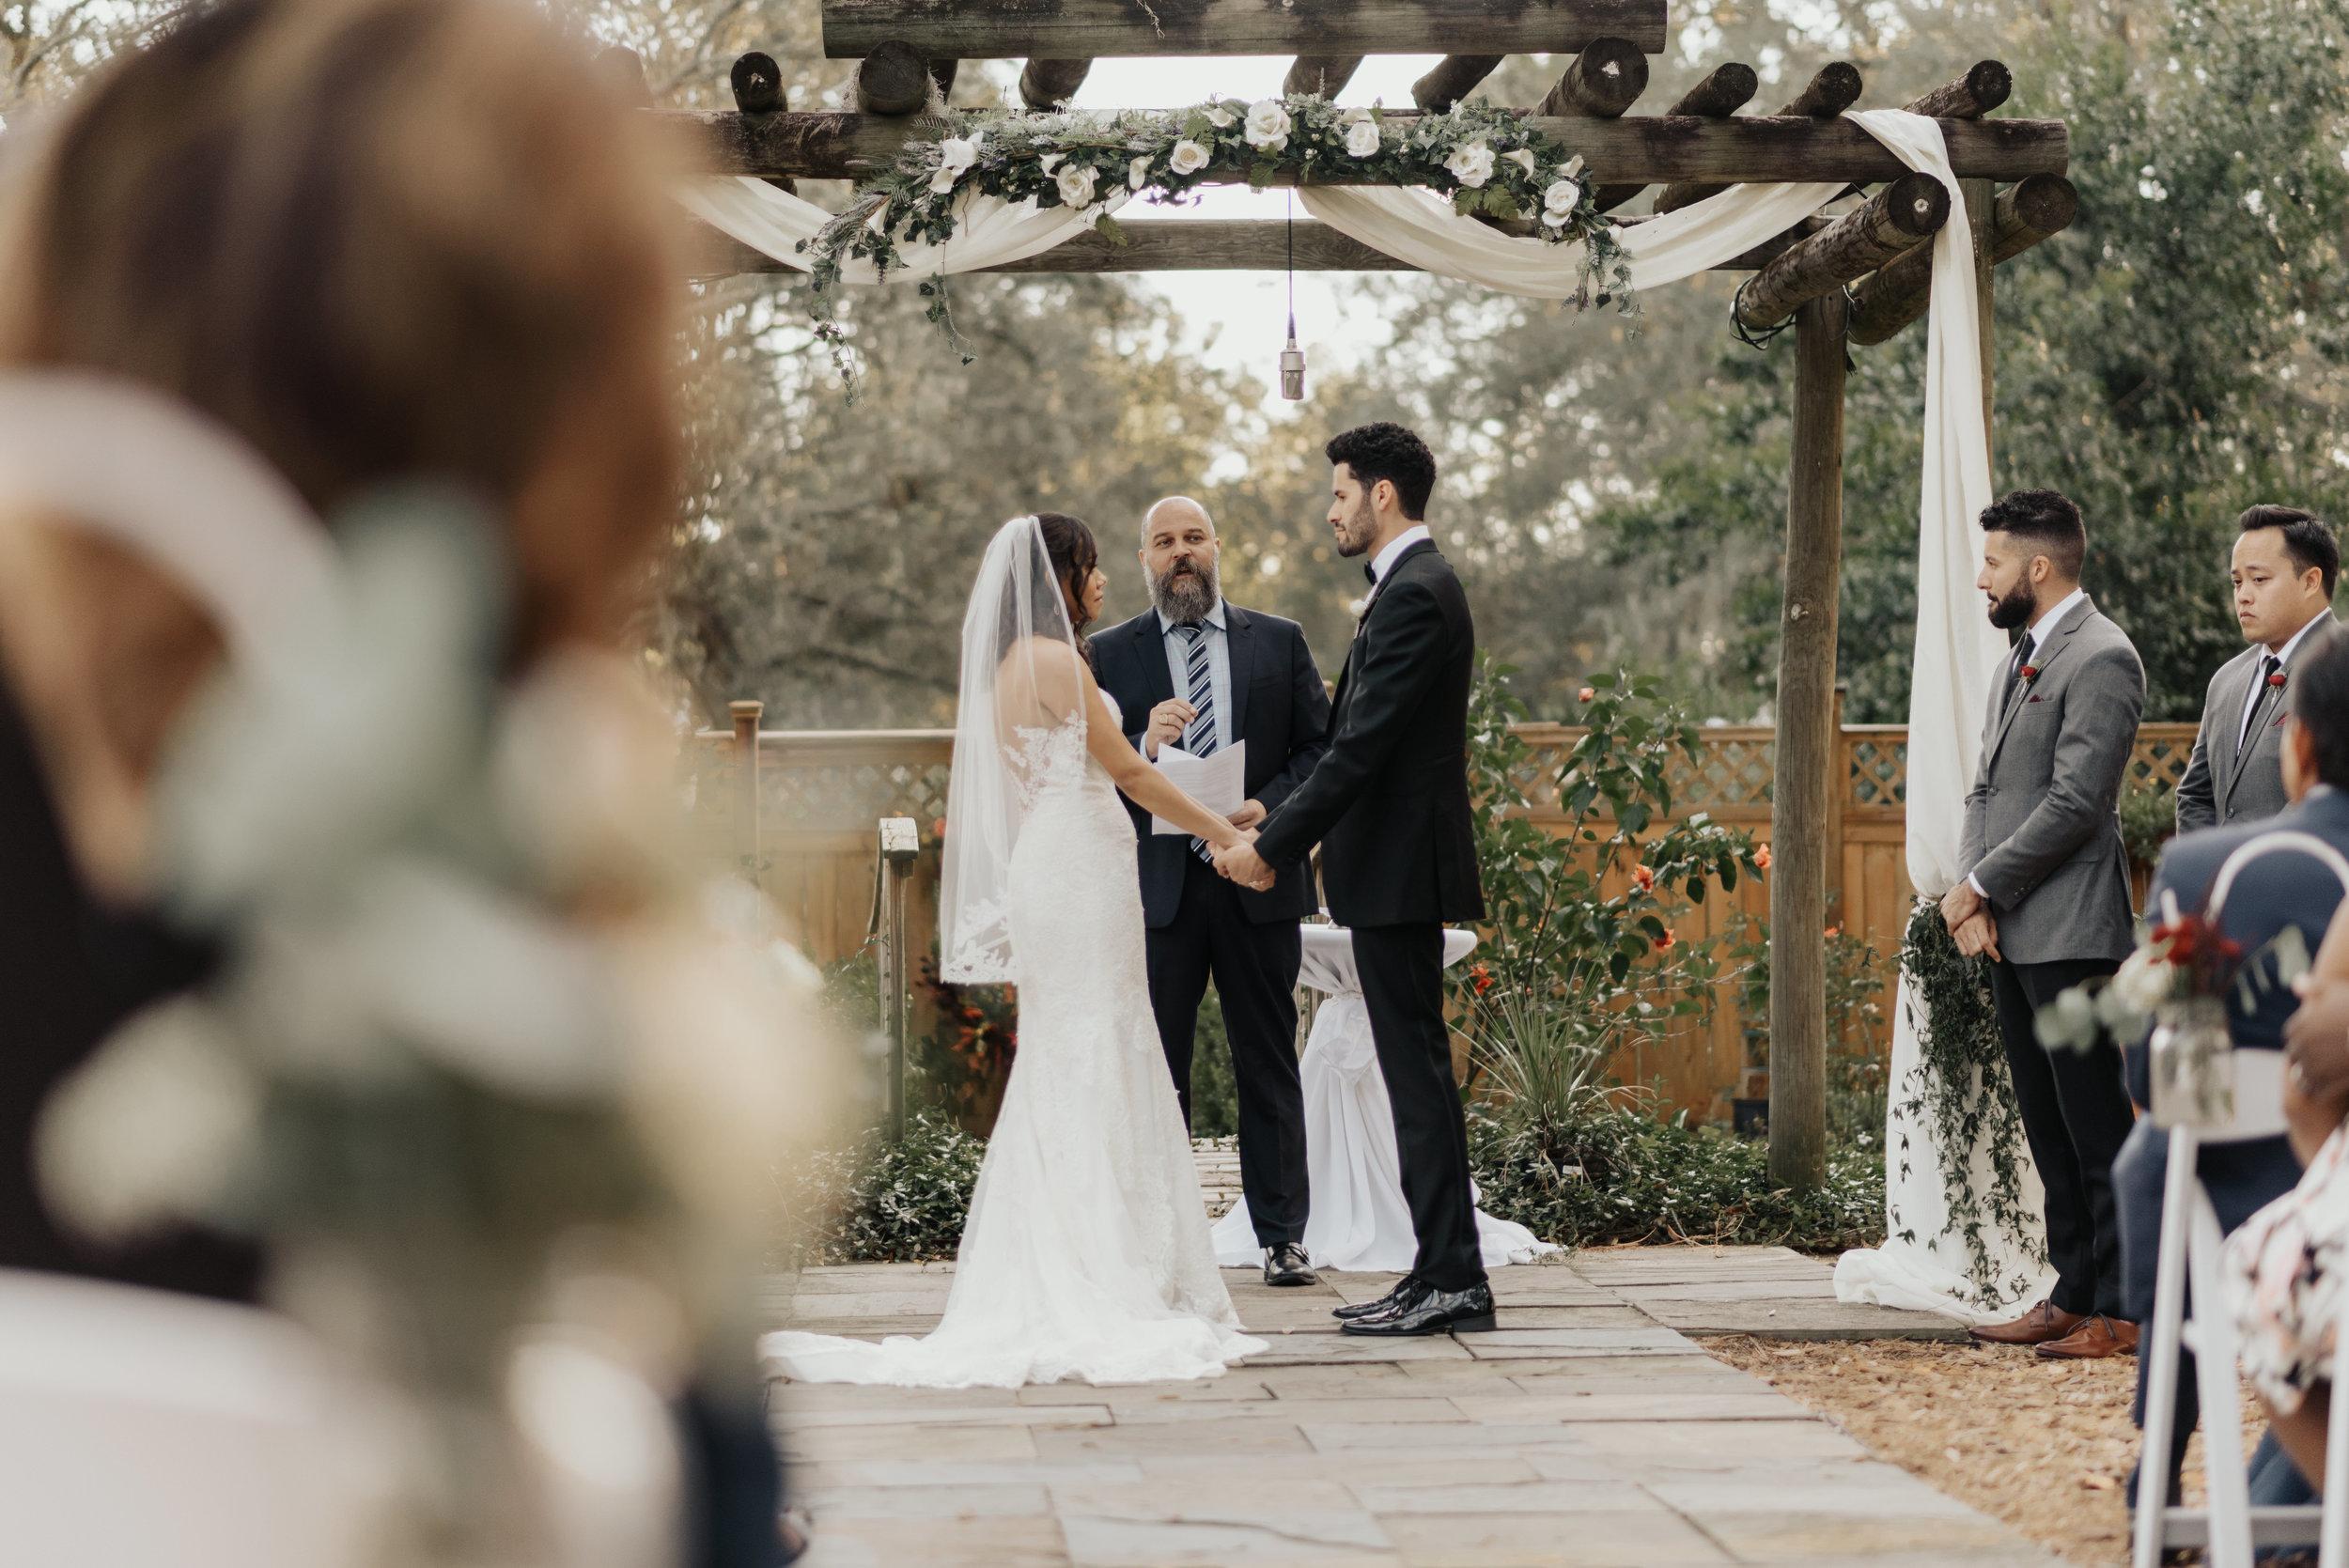 Kirstie-AJ-Wedding-0041.jpg